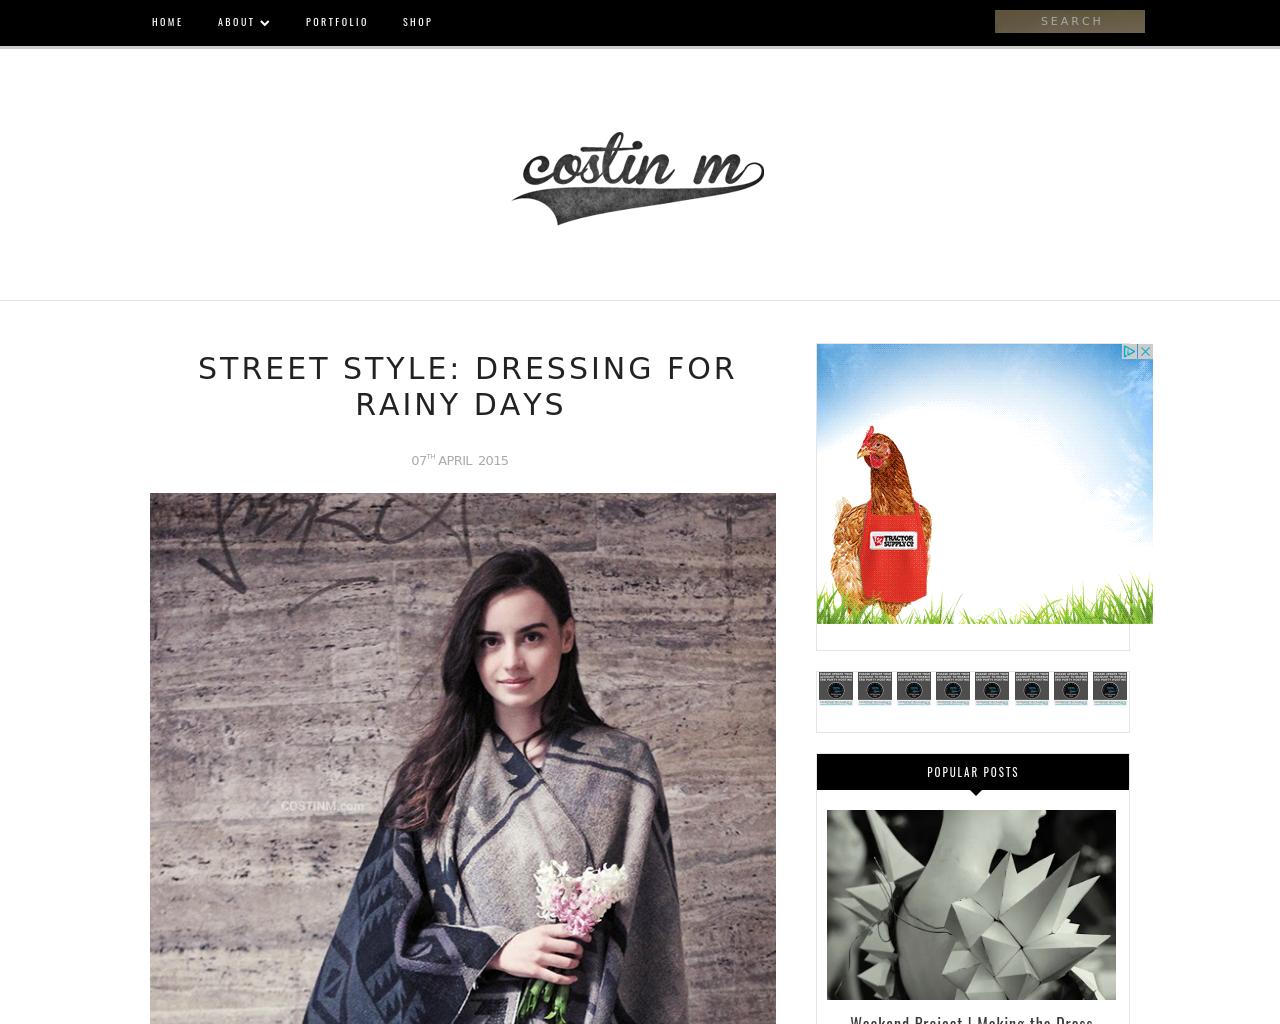 Costin-M-Advertising-Reviews-Pricing